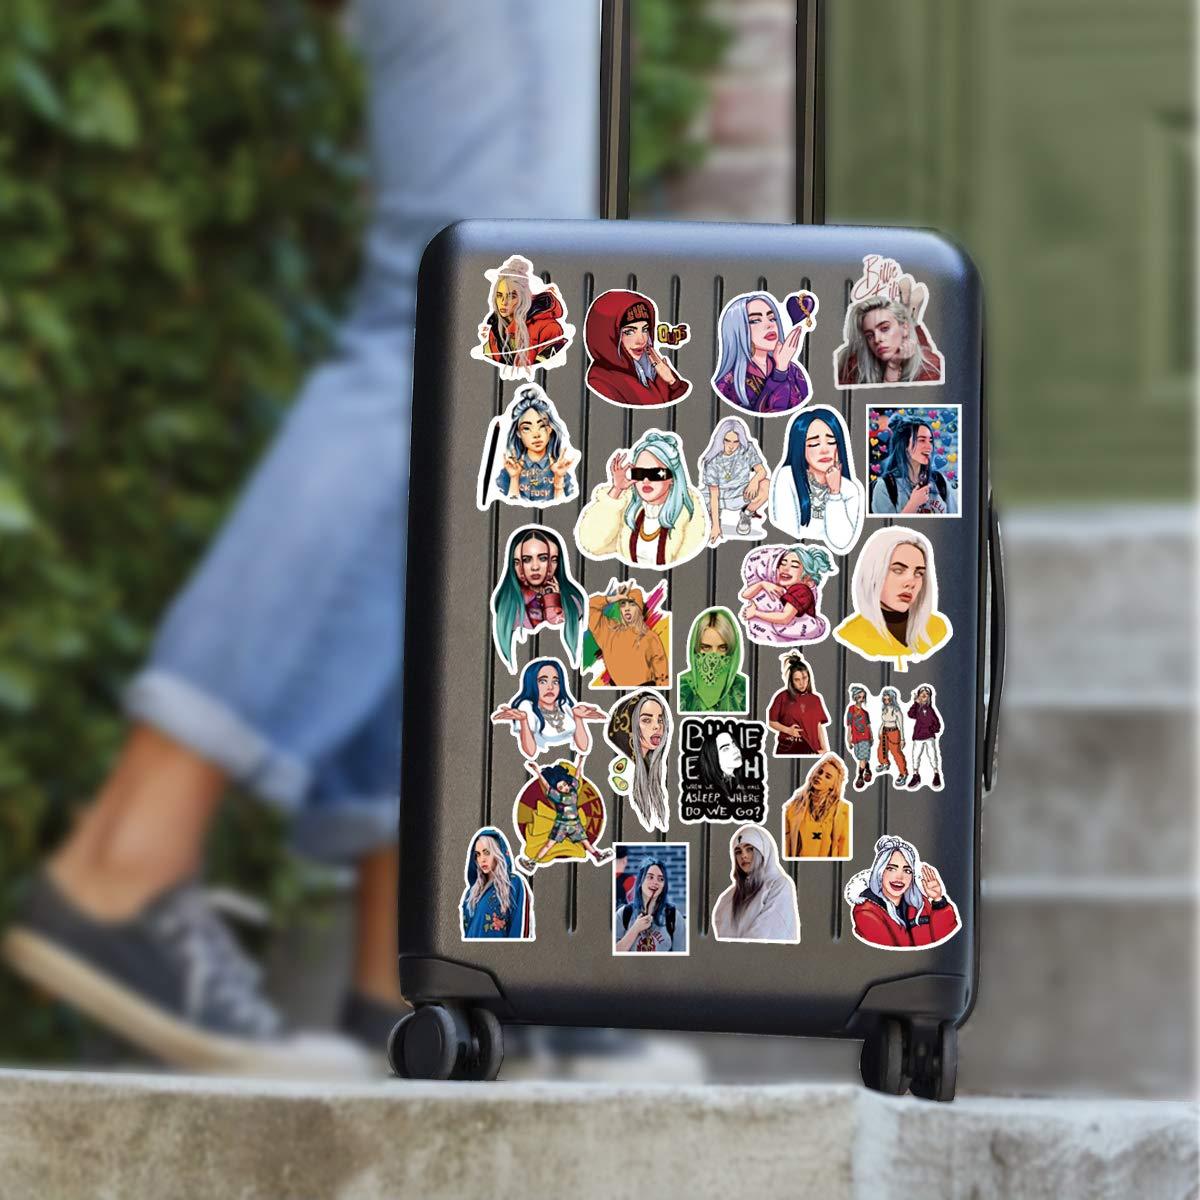 WOCOCO Singer Billie Eilish Stickers for Girls Kids Teen, Waterproof Vinyl Stickers for Laptop, Water Bottles, HydroFlask (50 Pack)